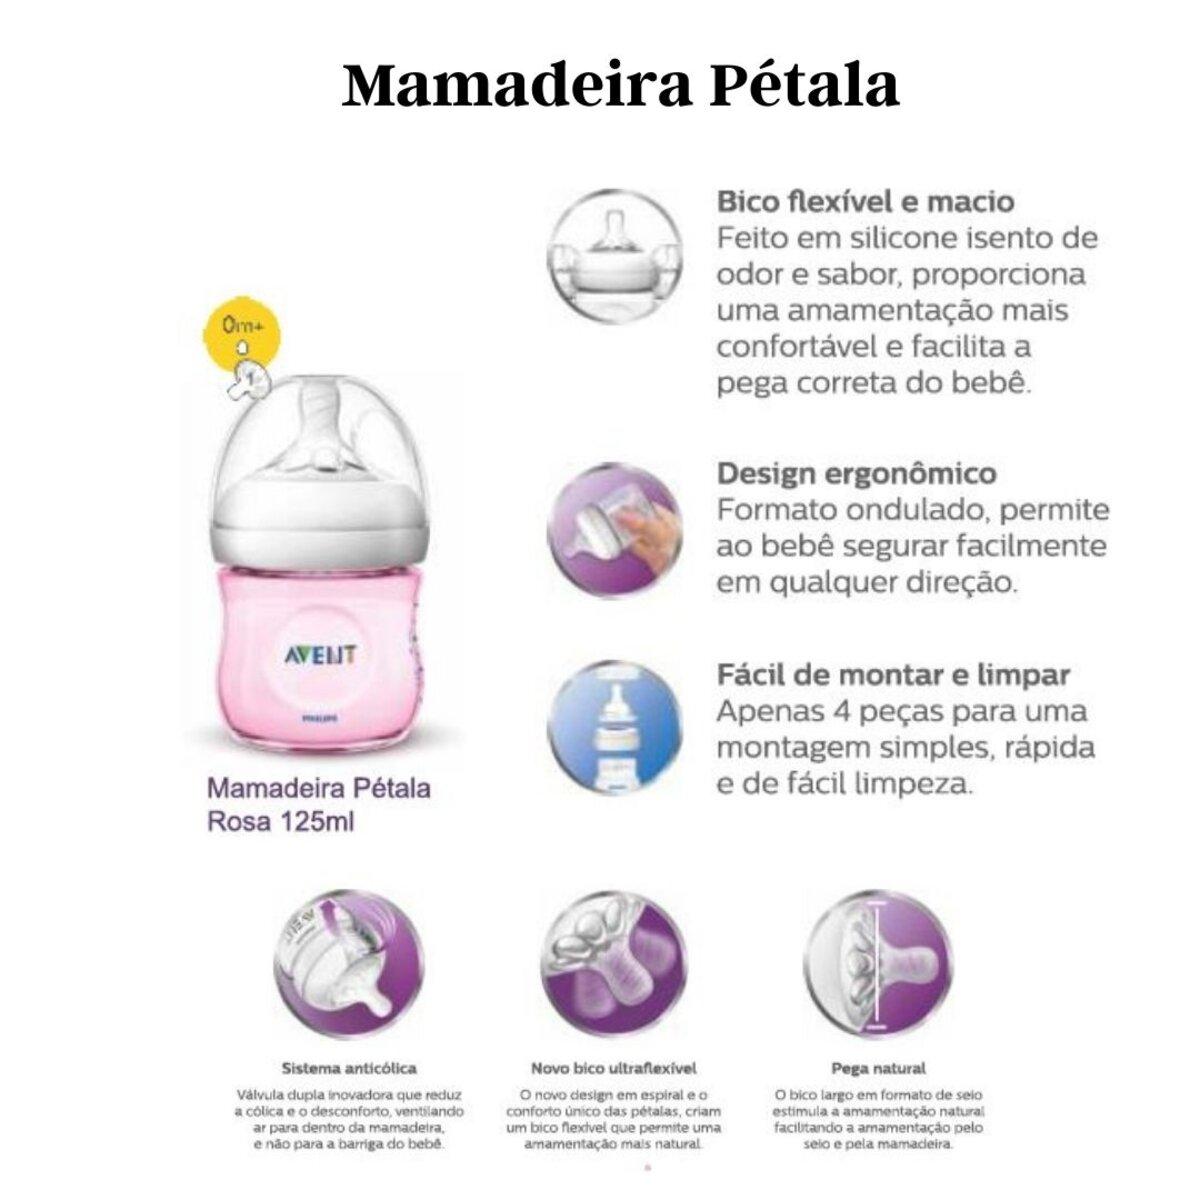 Mamadeira Pétala Rosa Philips Avent 125ml Bico nº1